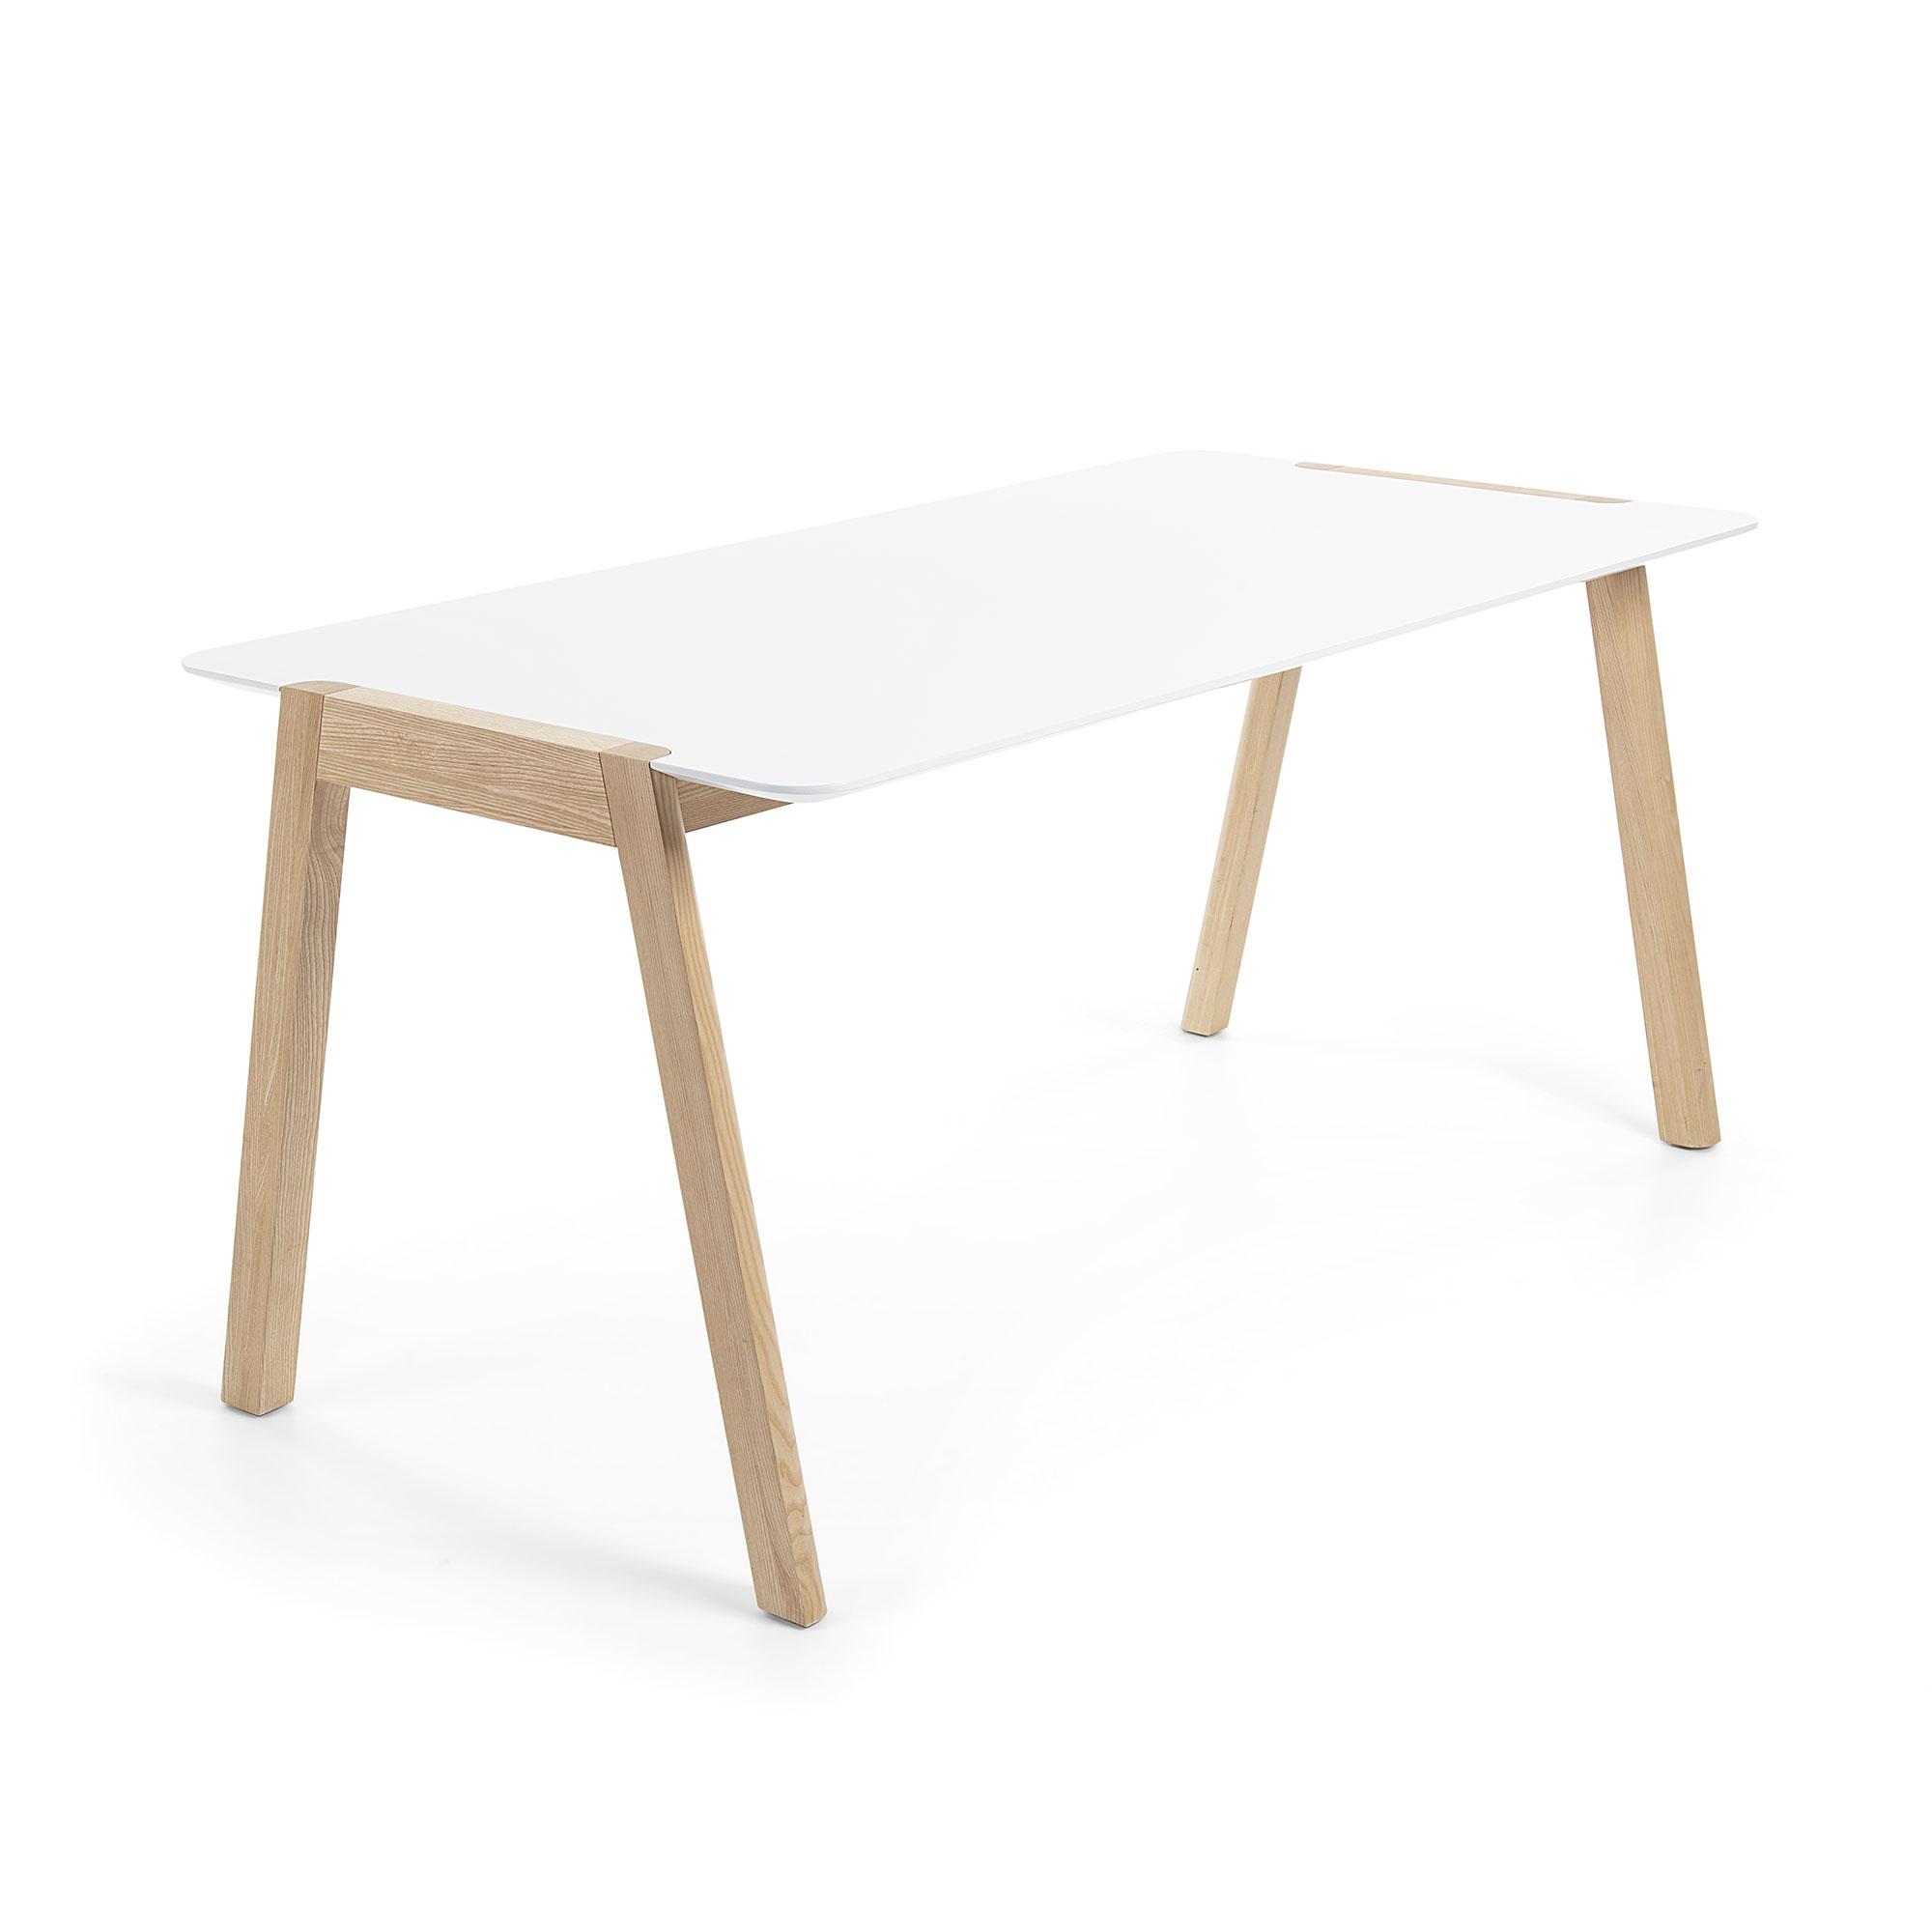 Mesa 200x90 madera fresno lacado blanco mate